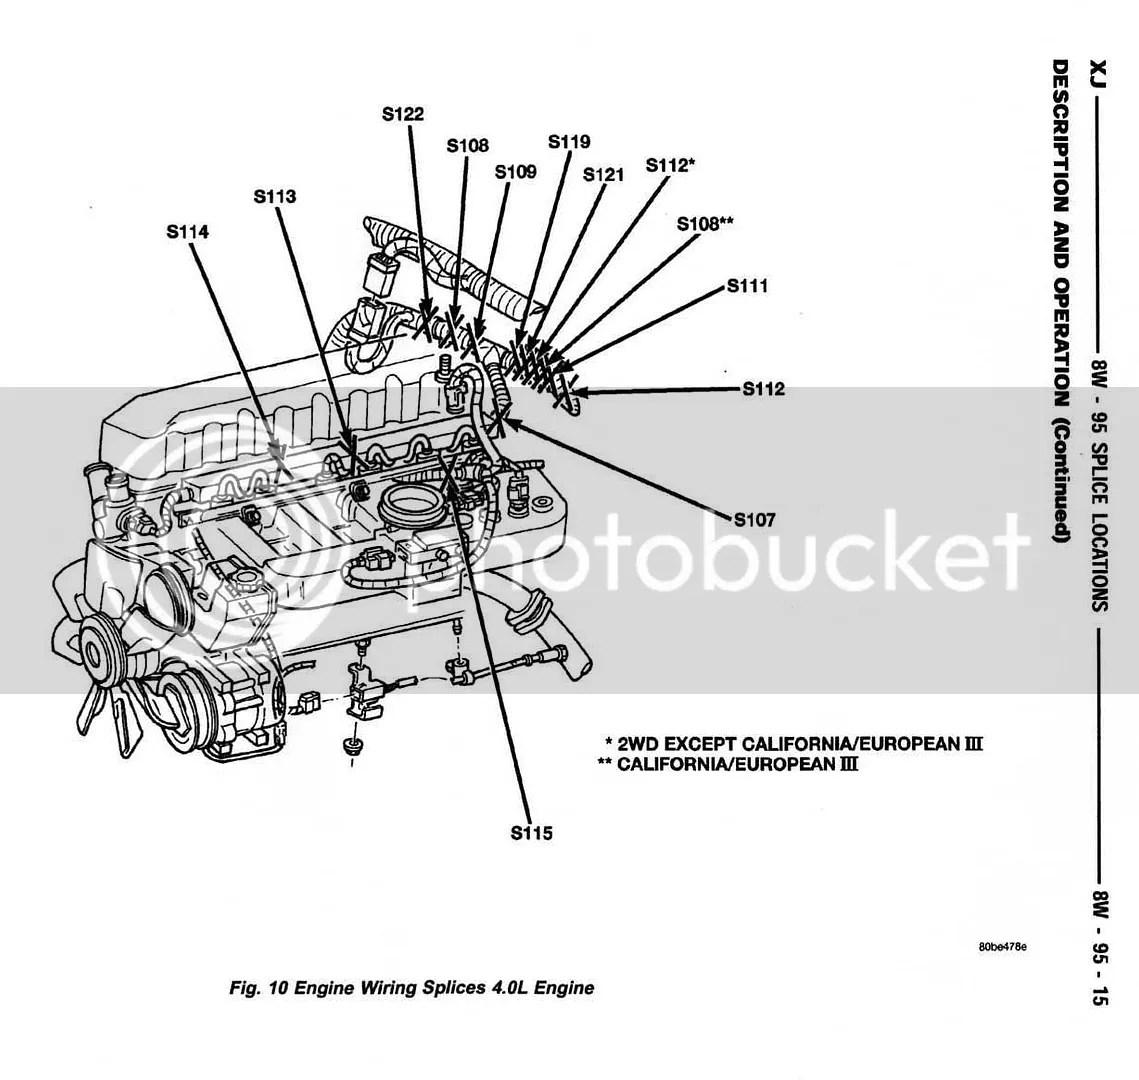 Oil Sending Unit Wiring Diagram - Catalogue of Schemas on